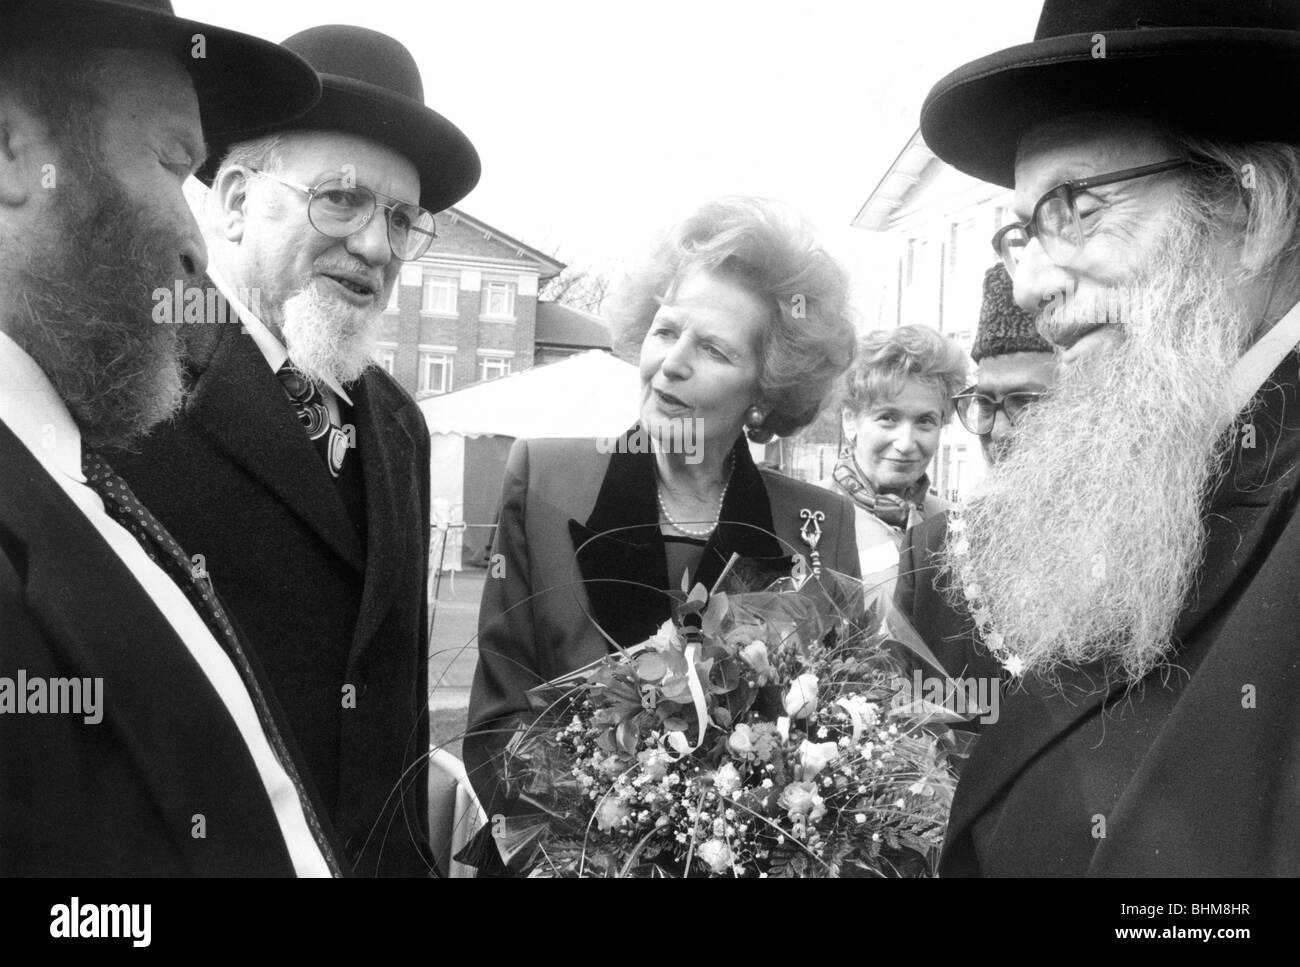 Margaret Thatcher with Jewish elders, Stoke Newington, London, 1995. Artist: John Nathan - Stock Image